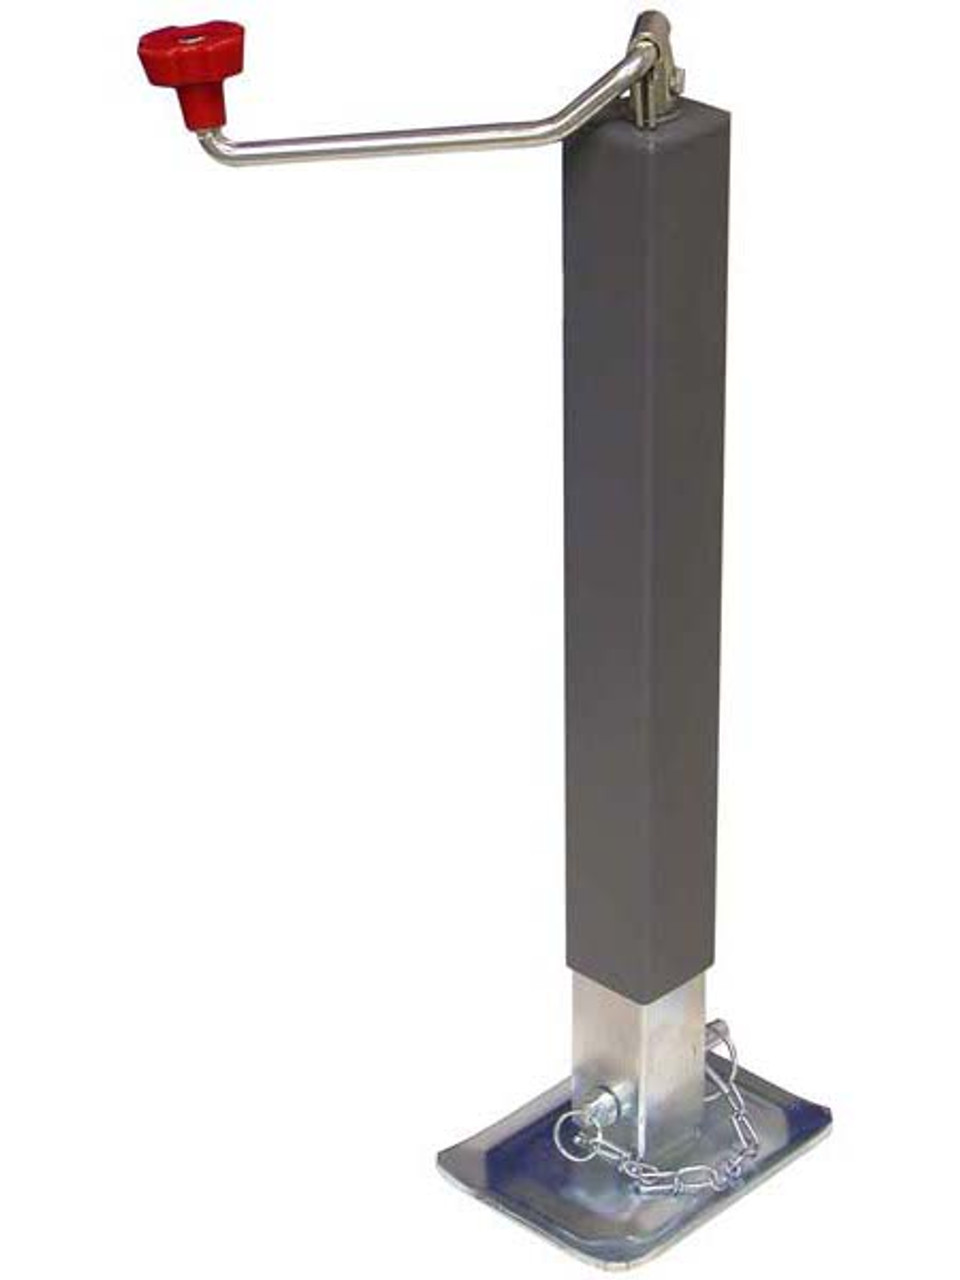 190704 --- BULLDOG Drop Leg Topwind Trailer Jack - 5,000 lb